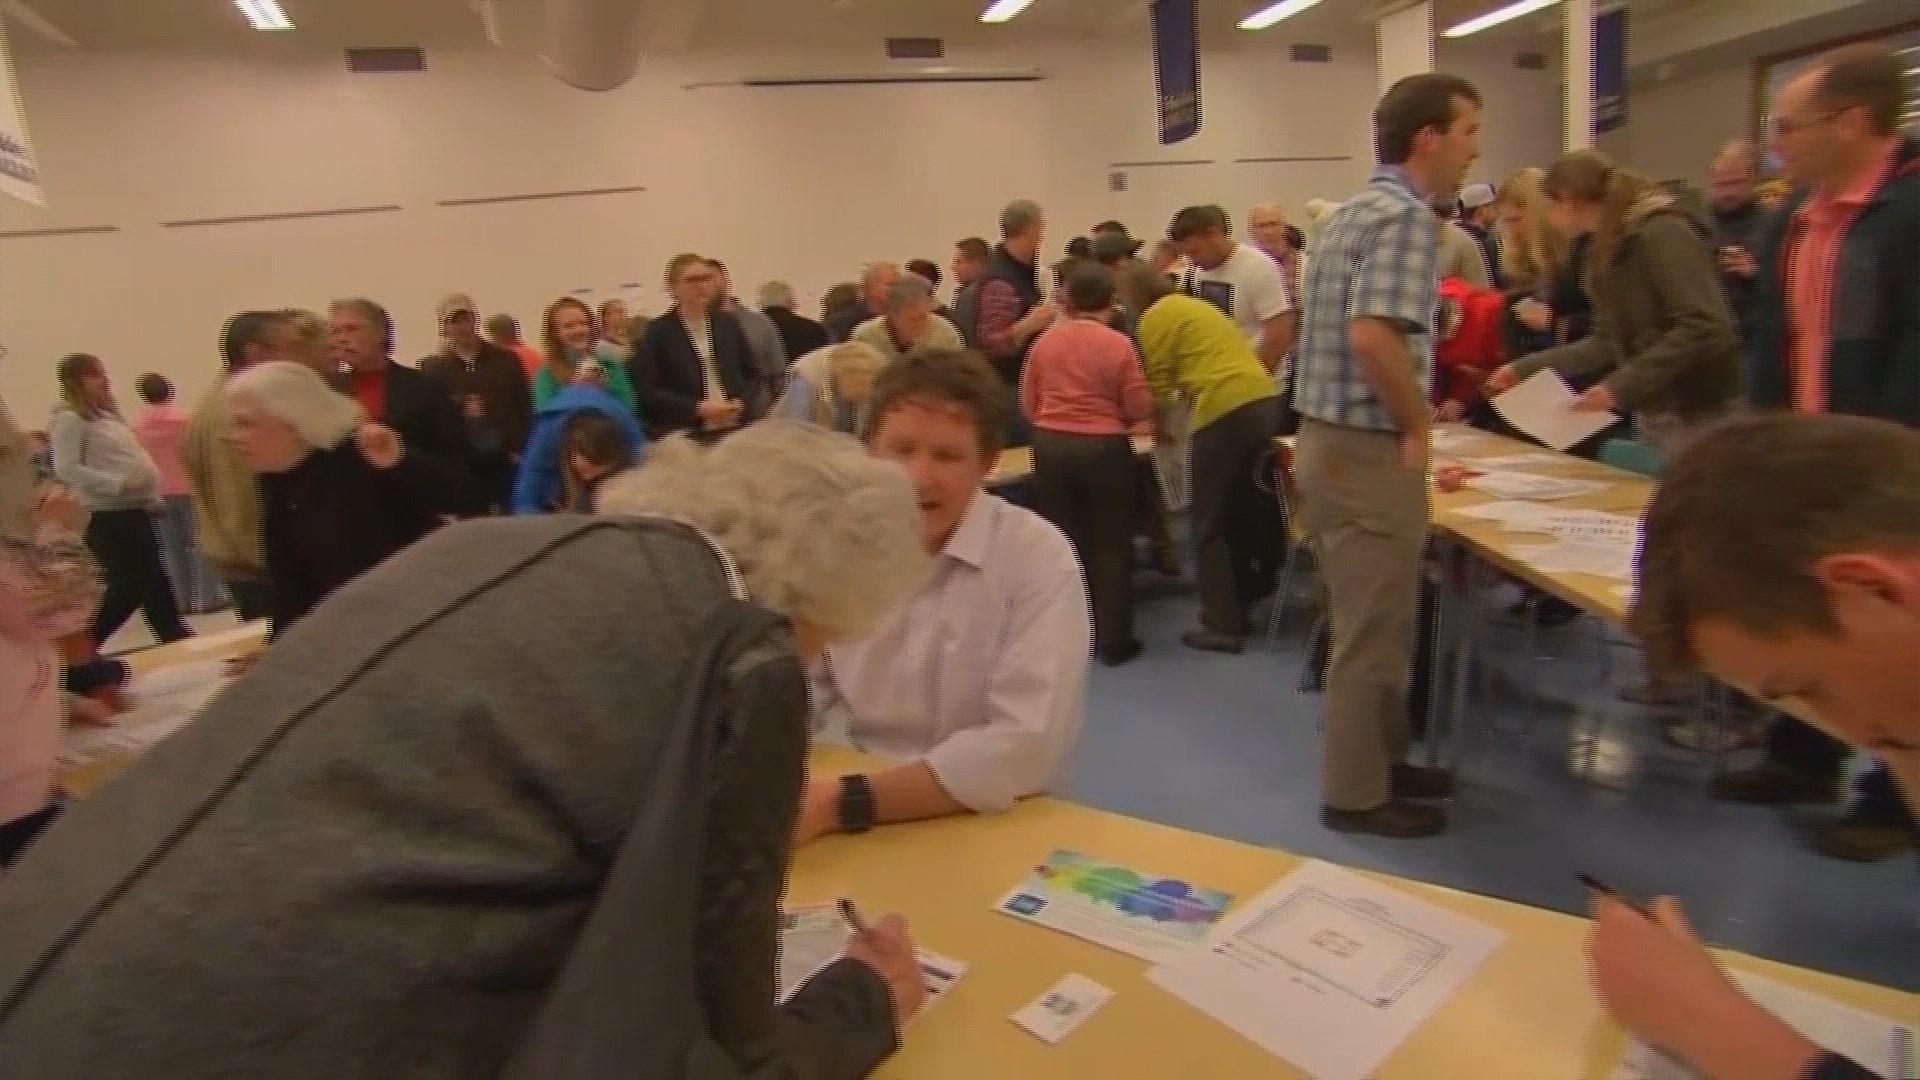 Washington Democrats set to caucus statewide